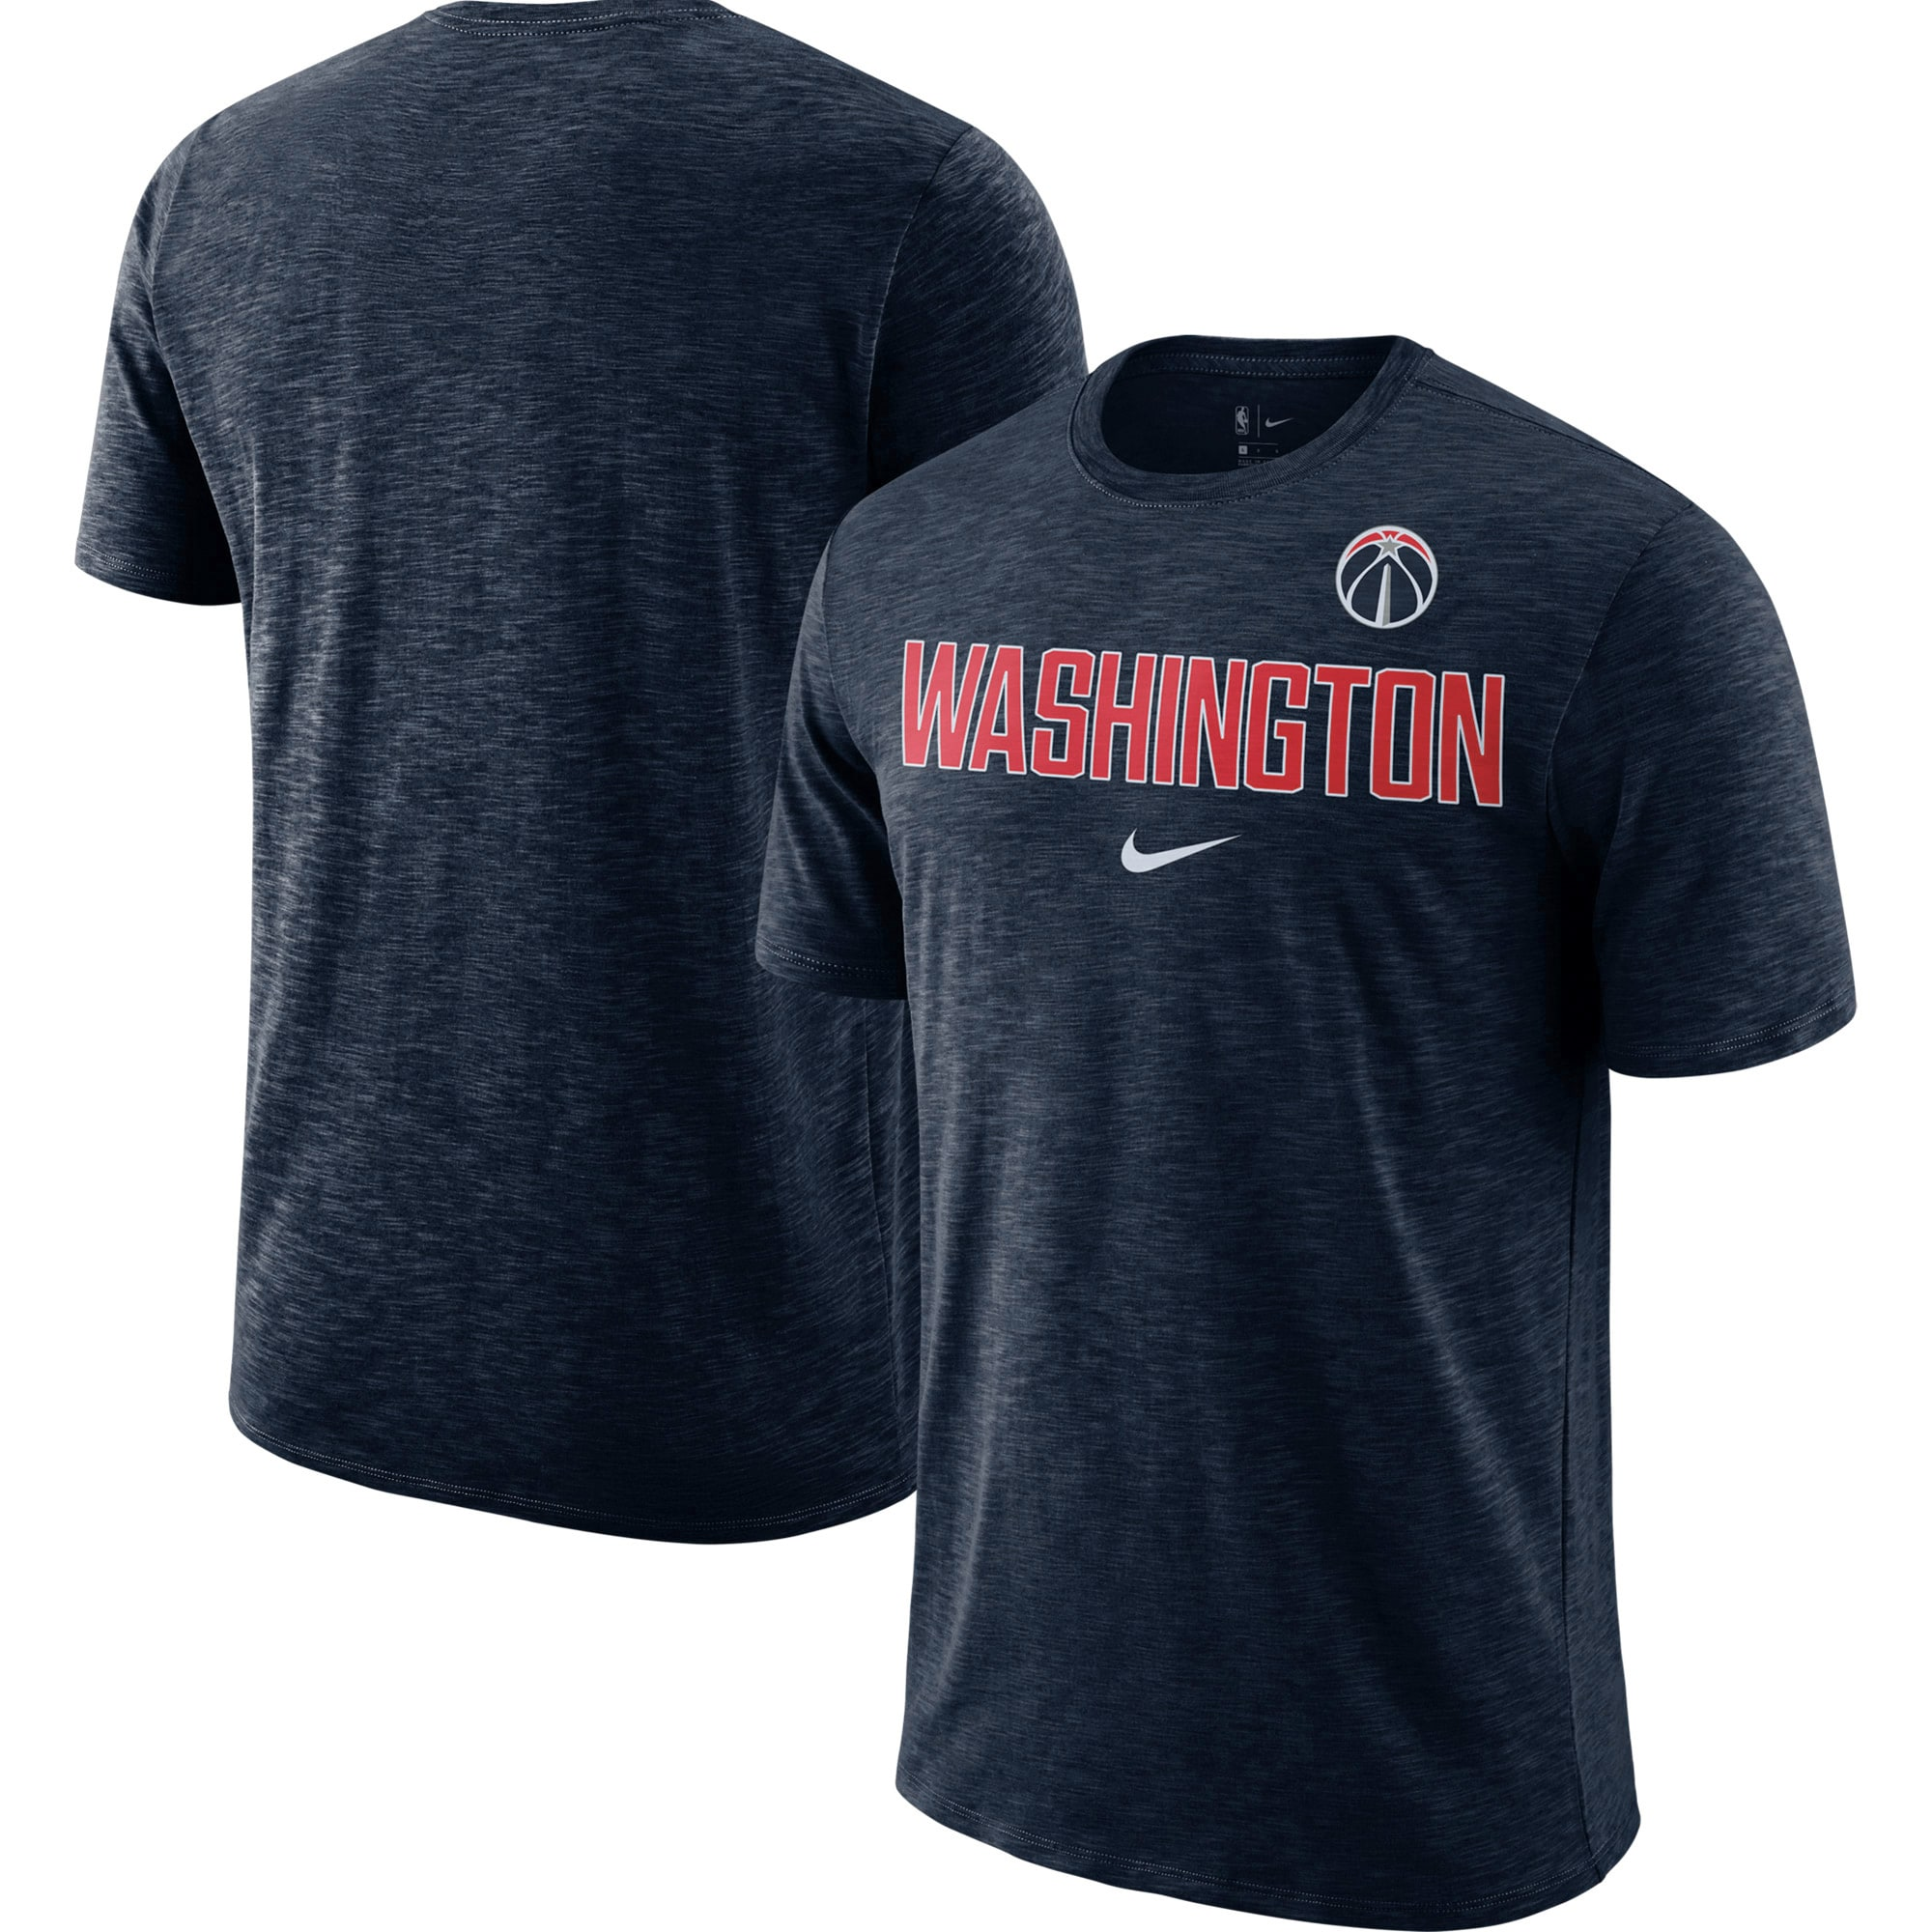 Washington Wizards Nike Essential Facility Slub Performance T-Shirt - Heathered Navy